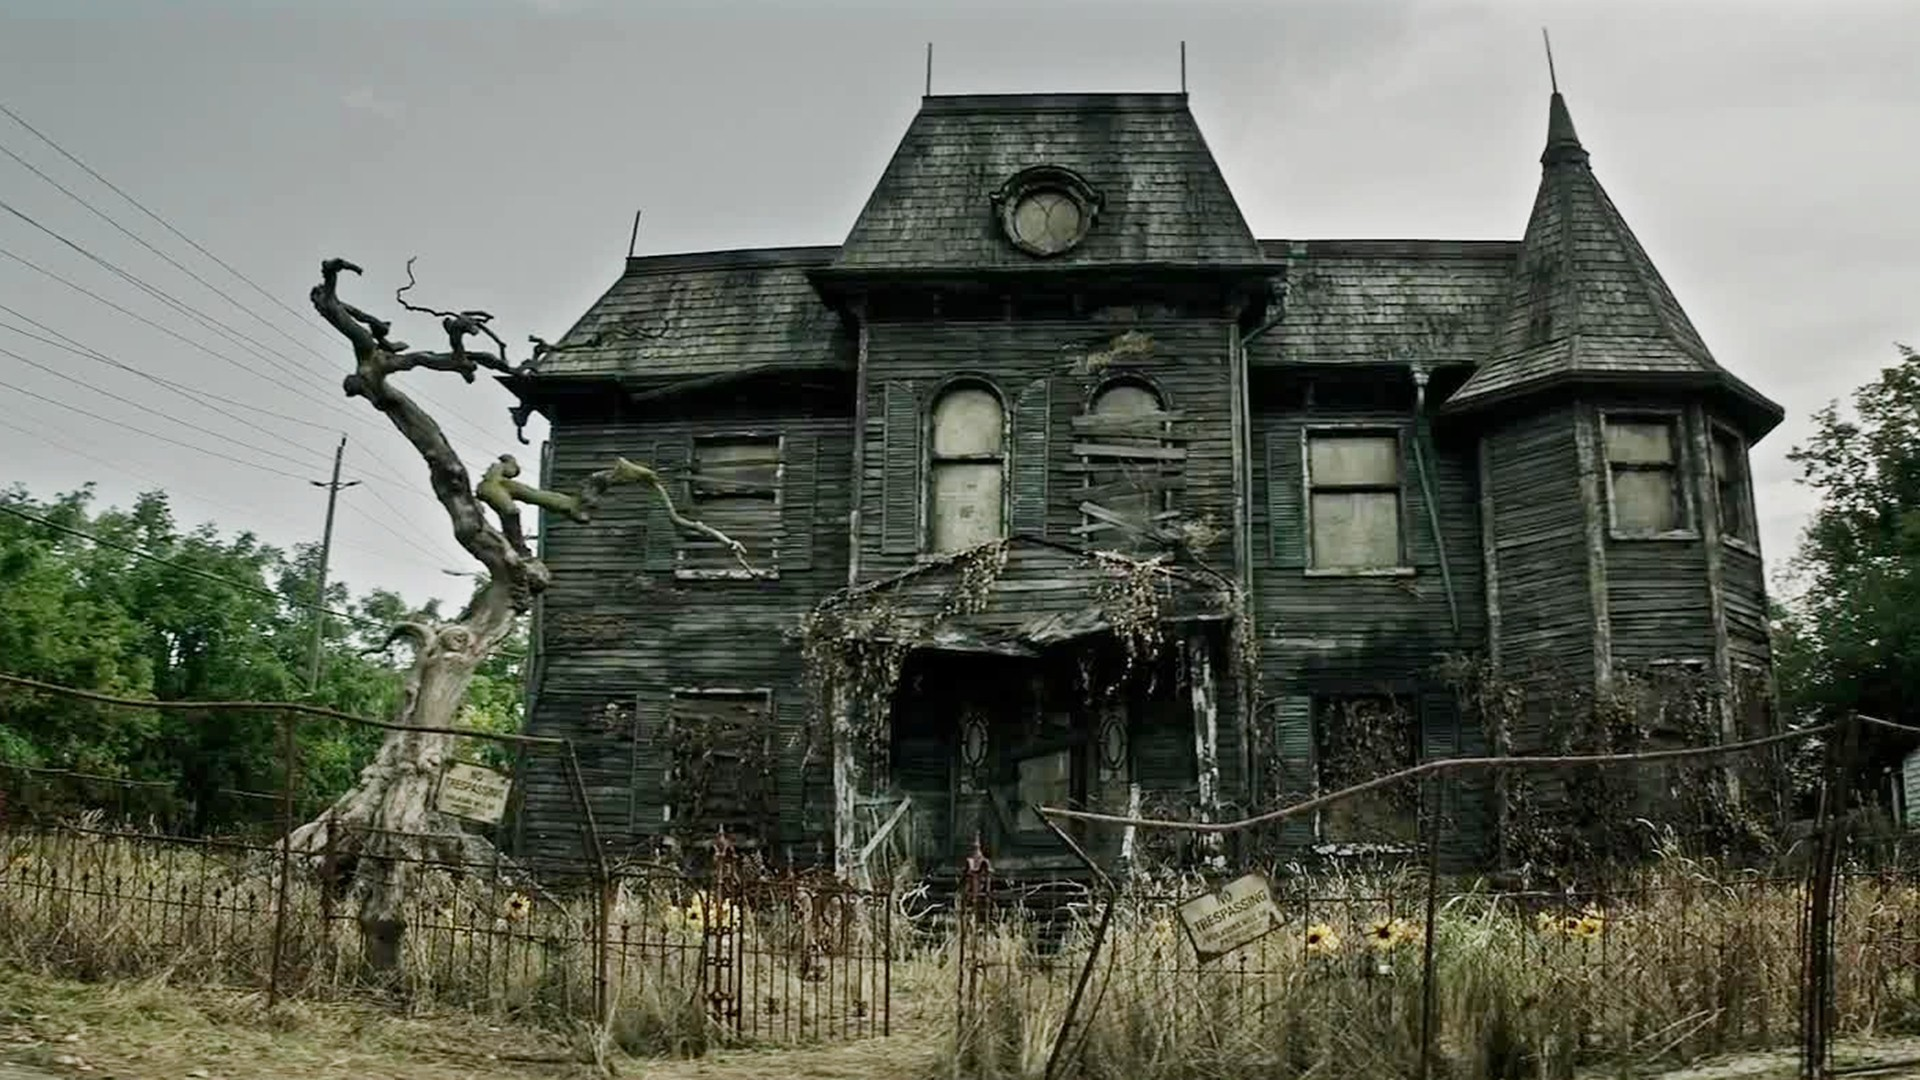 Haunted House Desktop Wallpaper (66+ images)